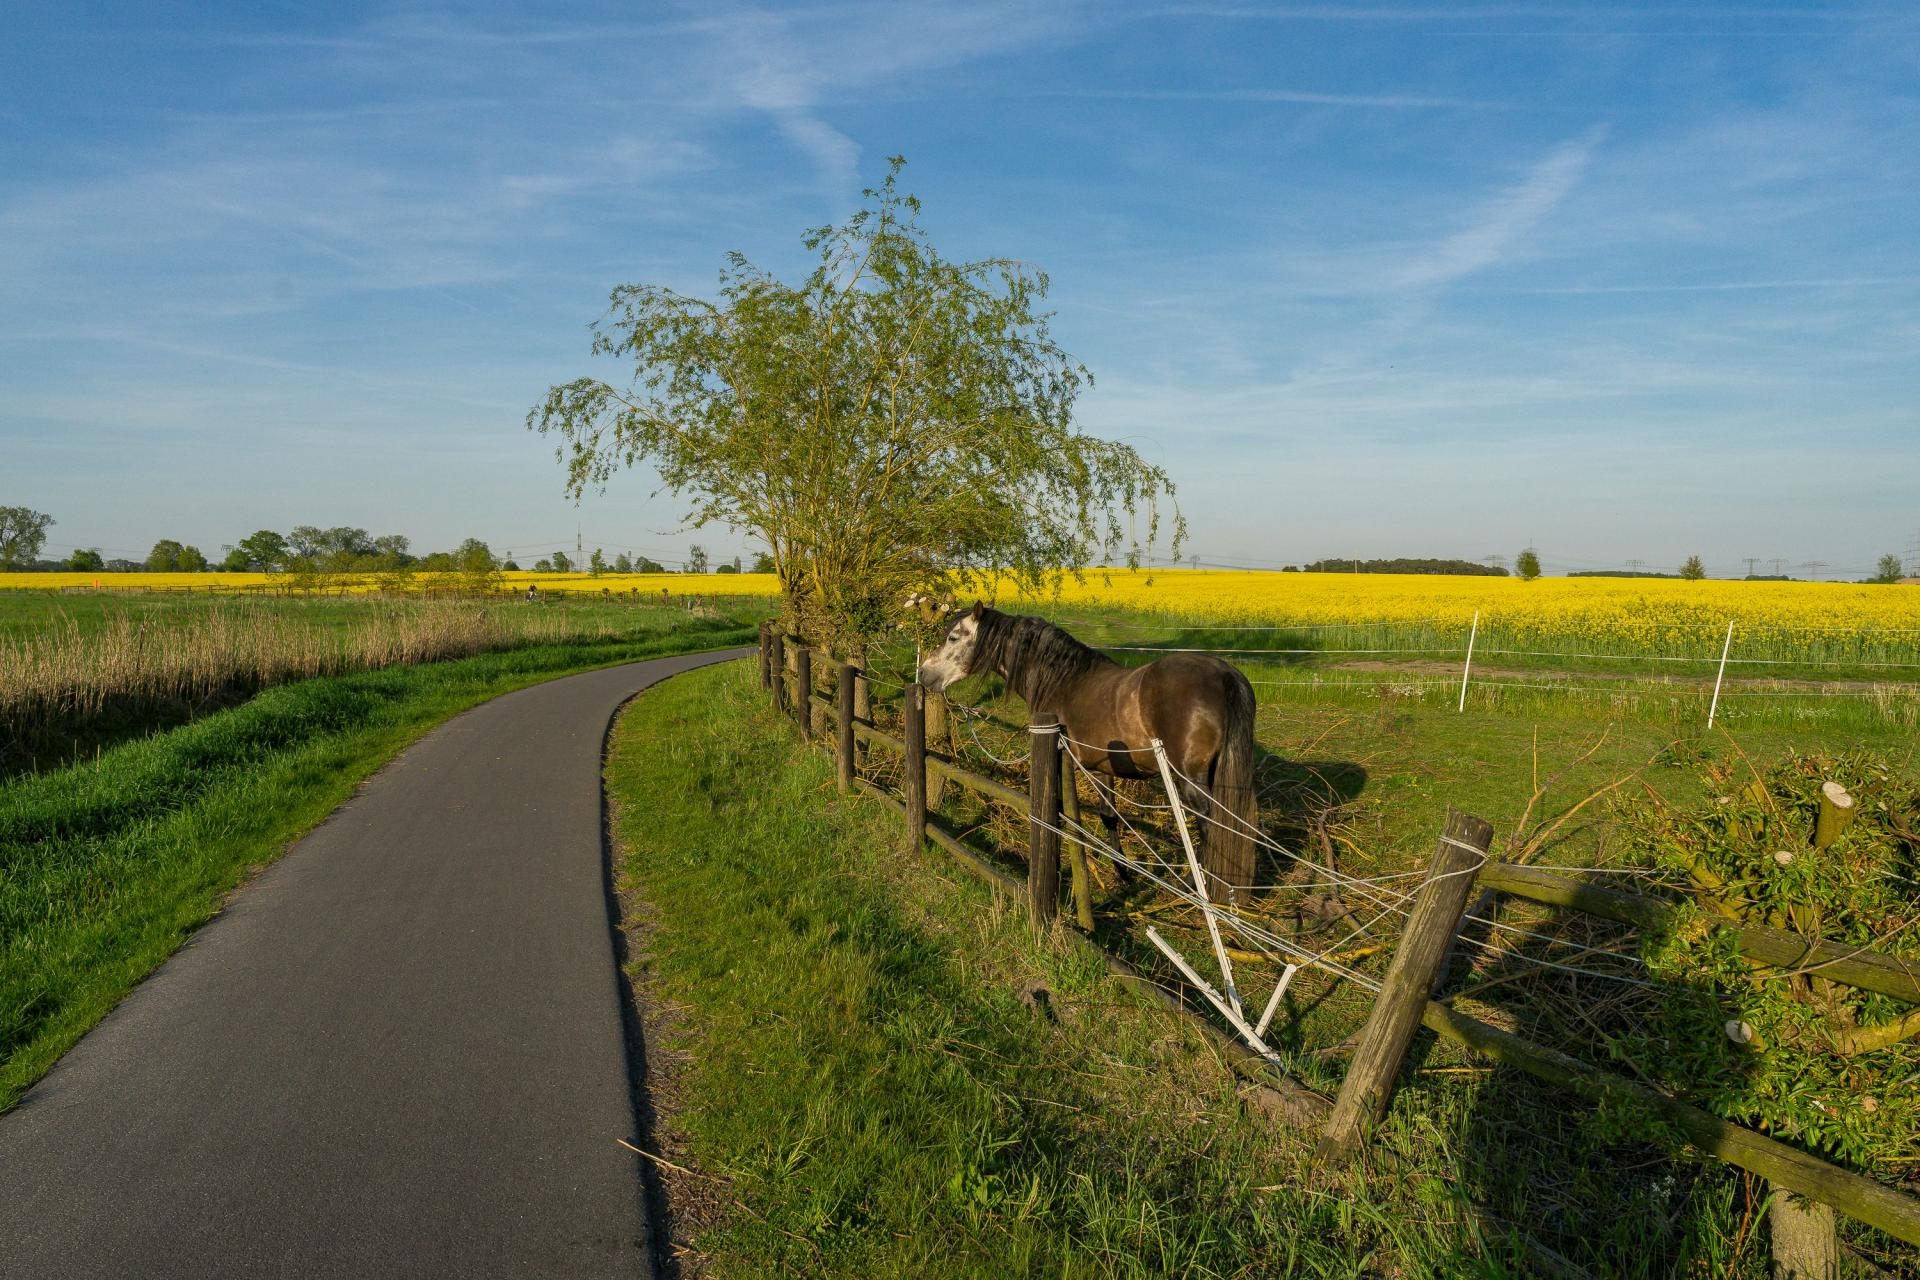 Fahrradweg am Teichgraben (Altlandsberg)